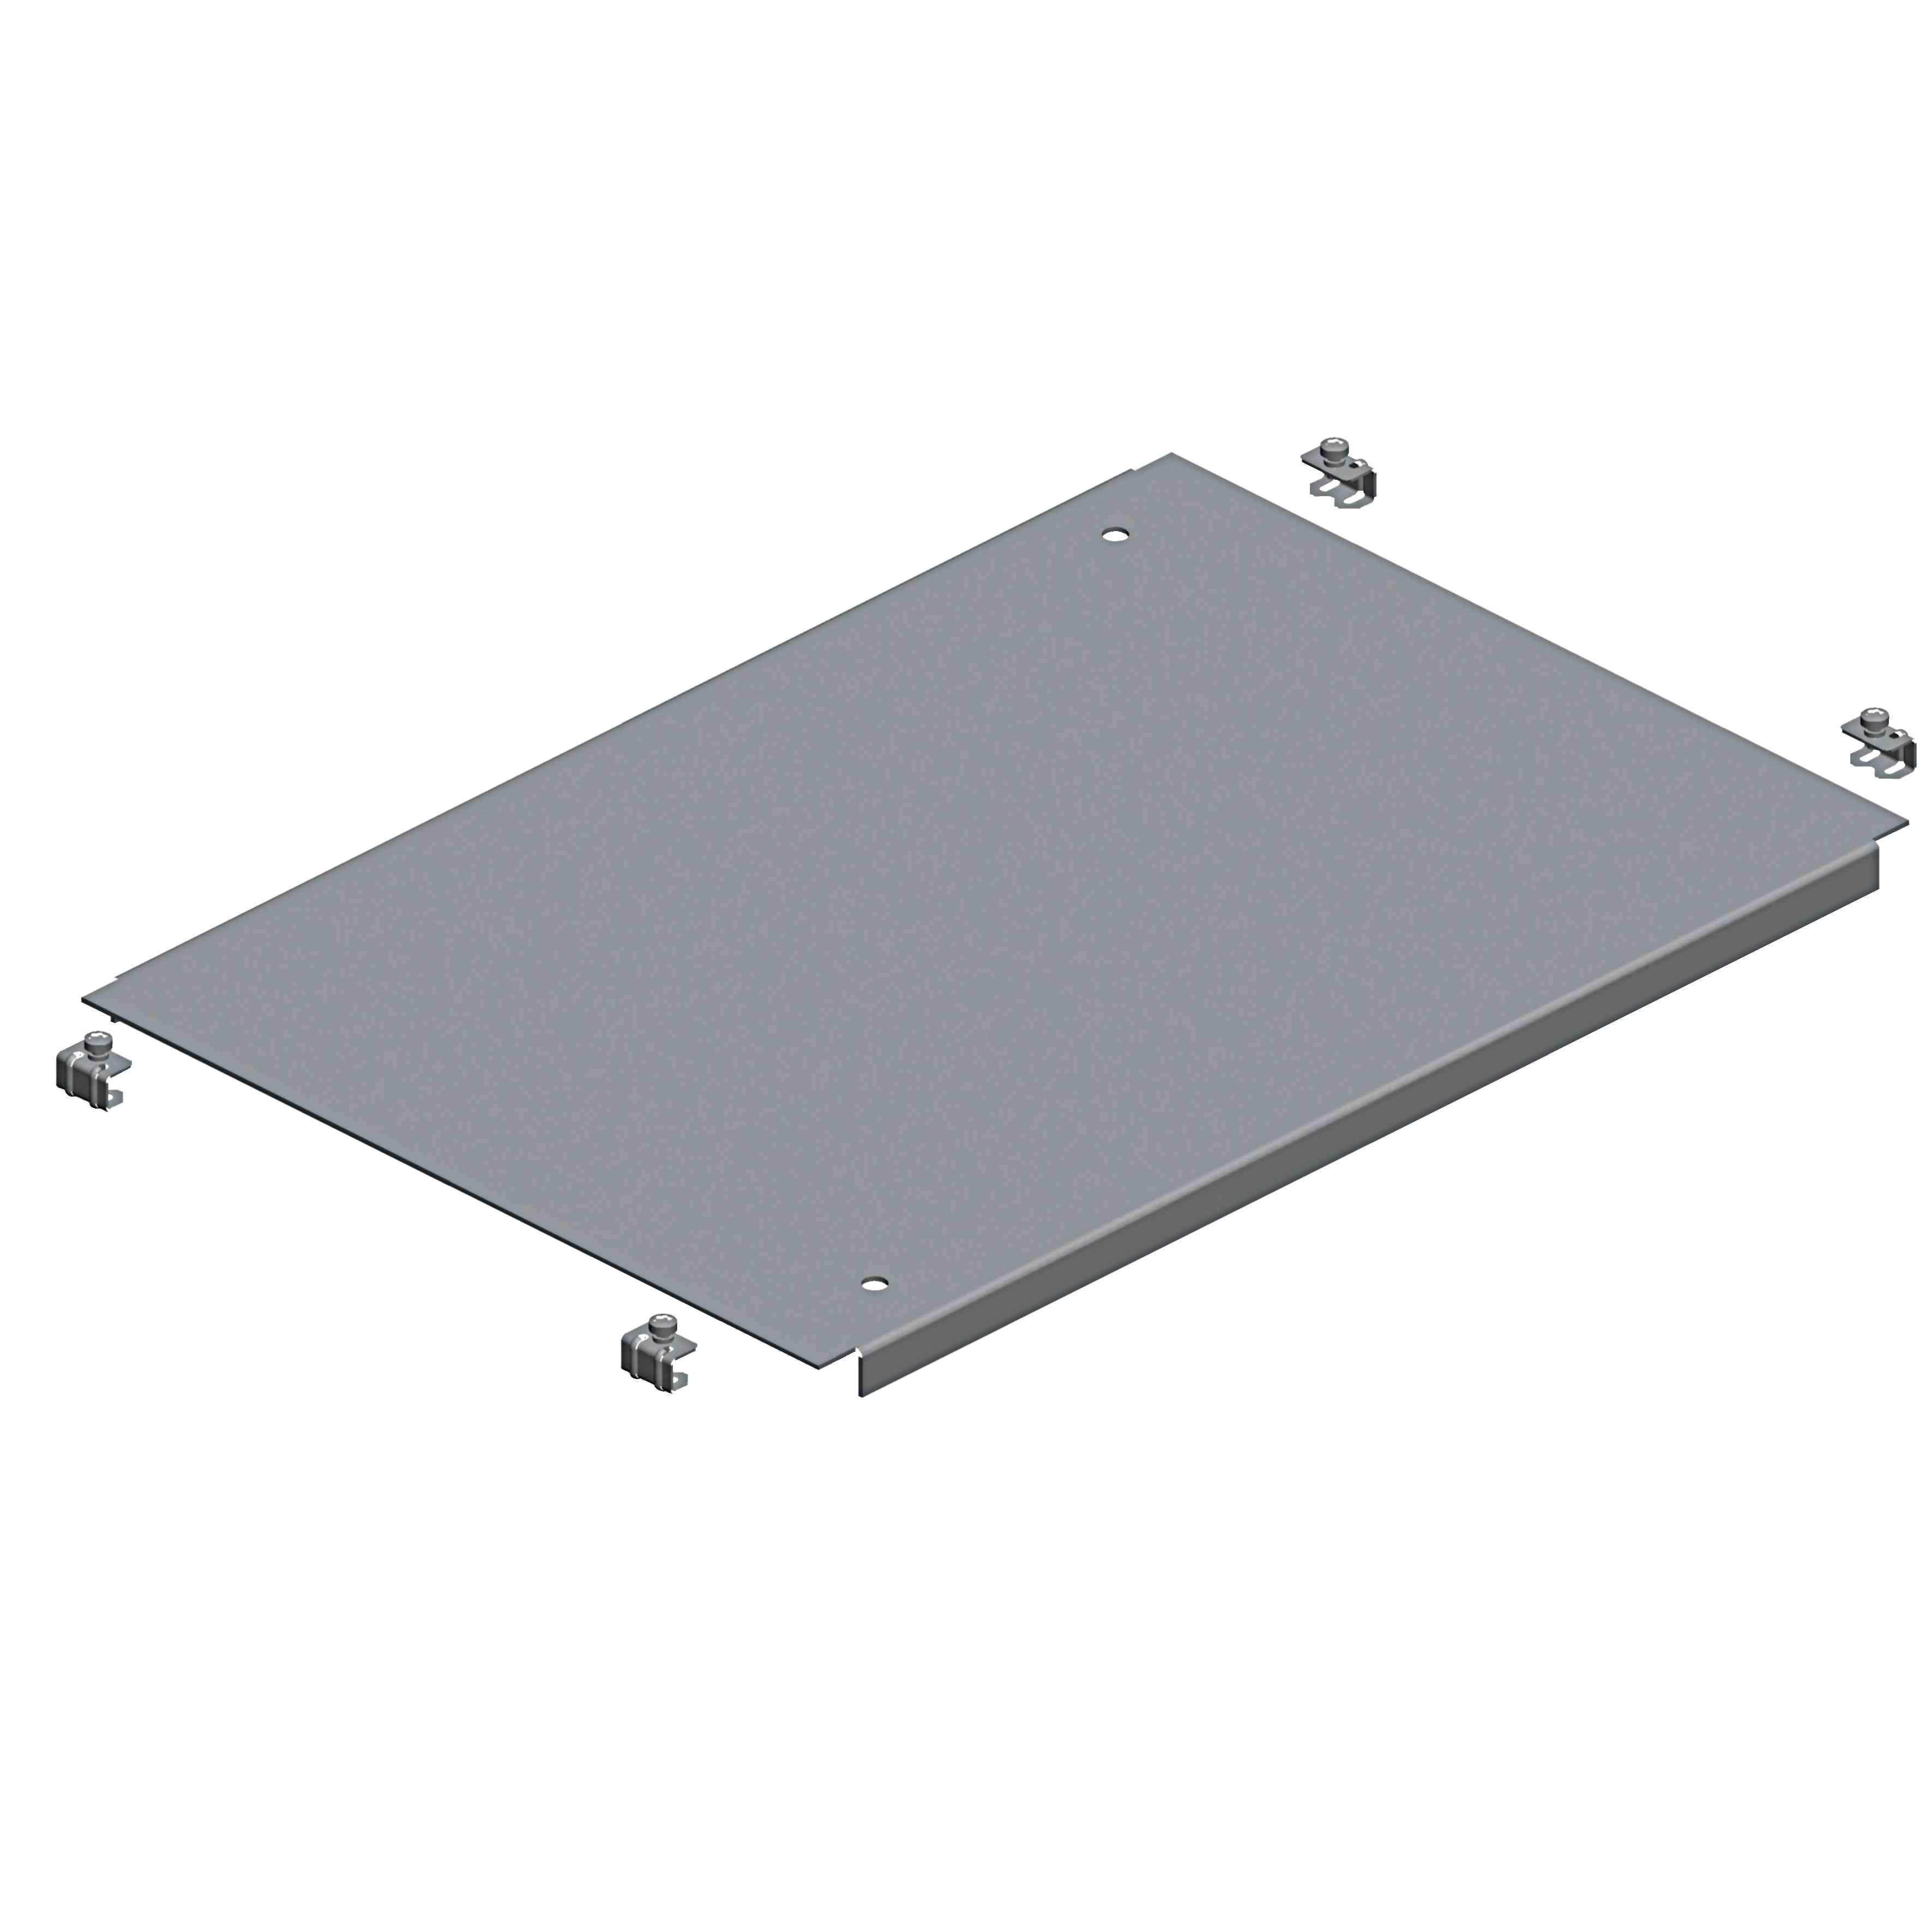 Spacial SF navadna plošča kab. uvodnice - pritr. s sponkami - 600 x 600 mm